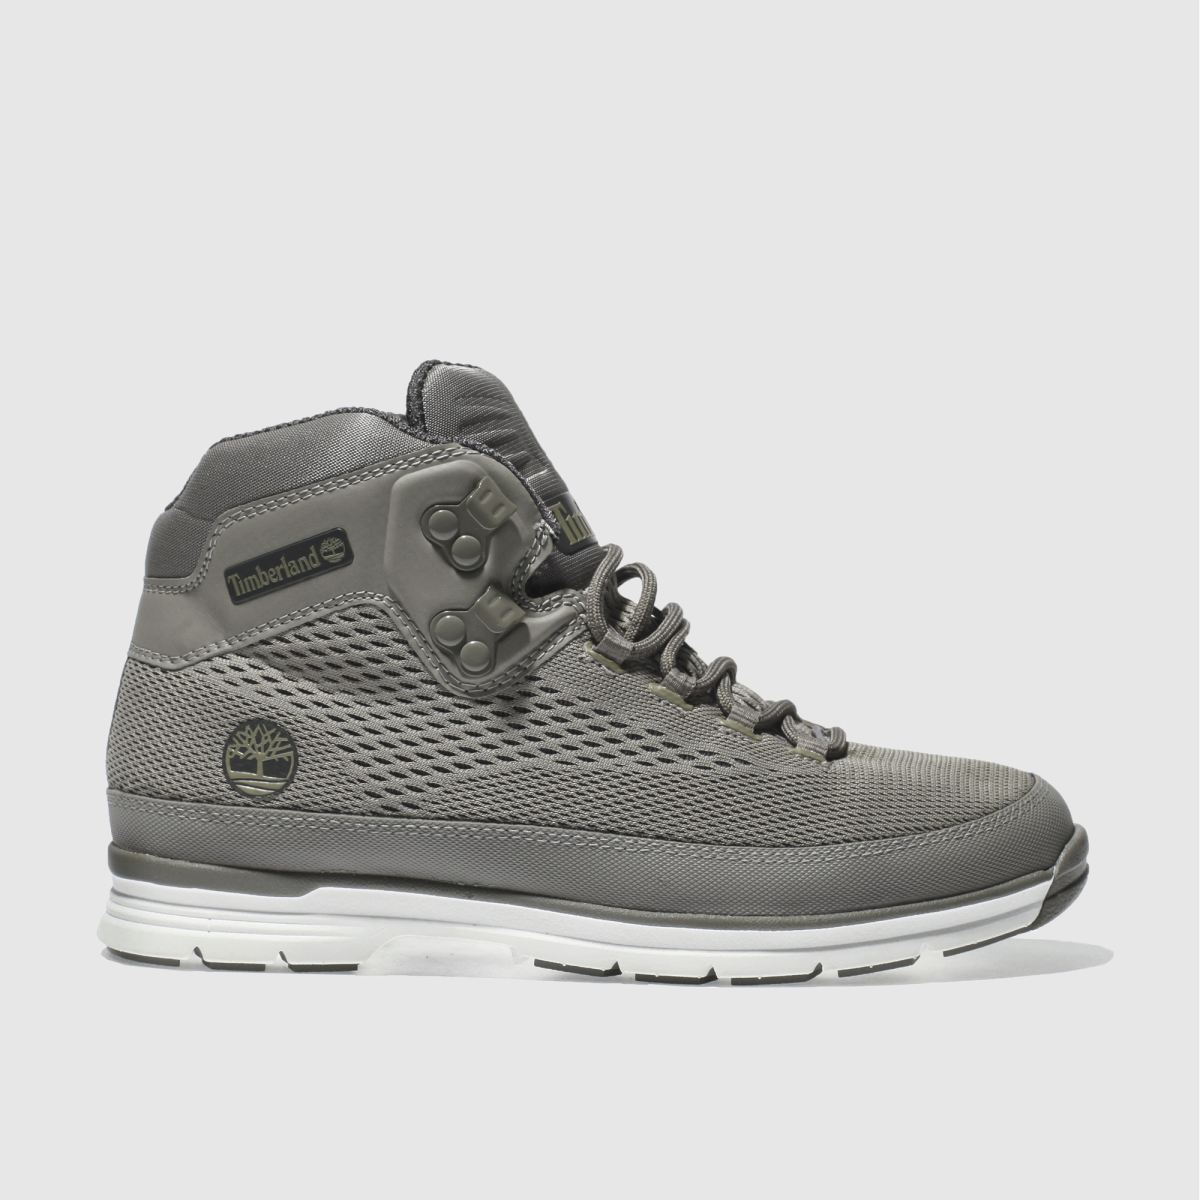 timberland grey euro hiker sf boots